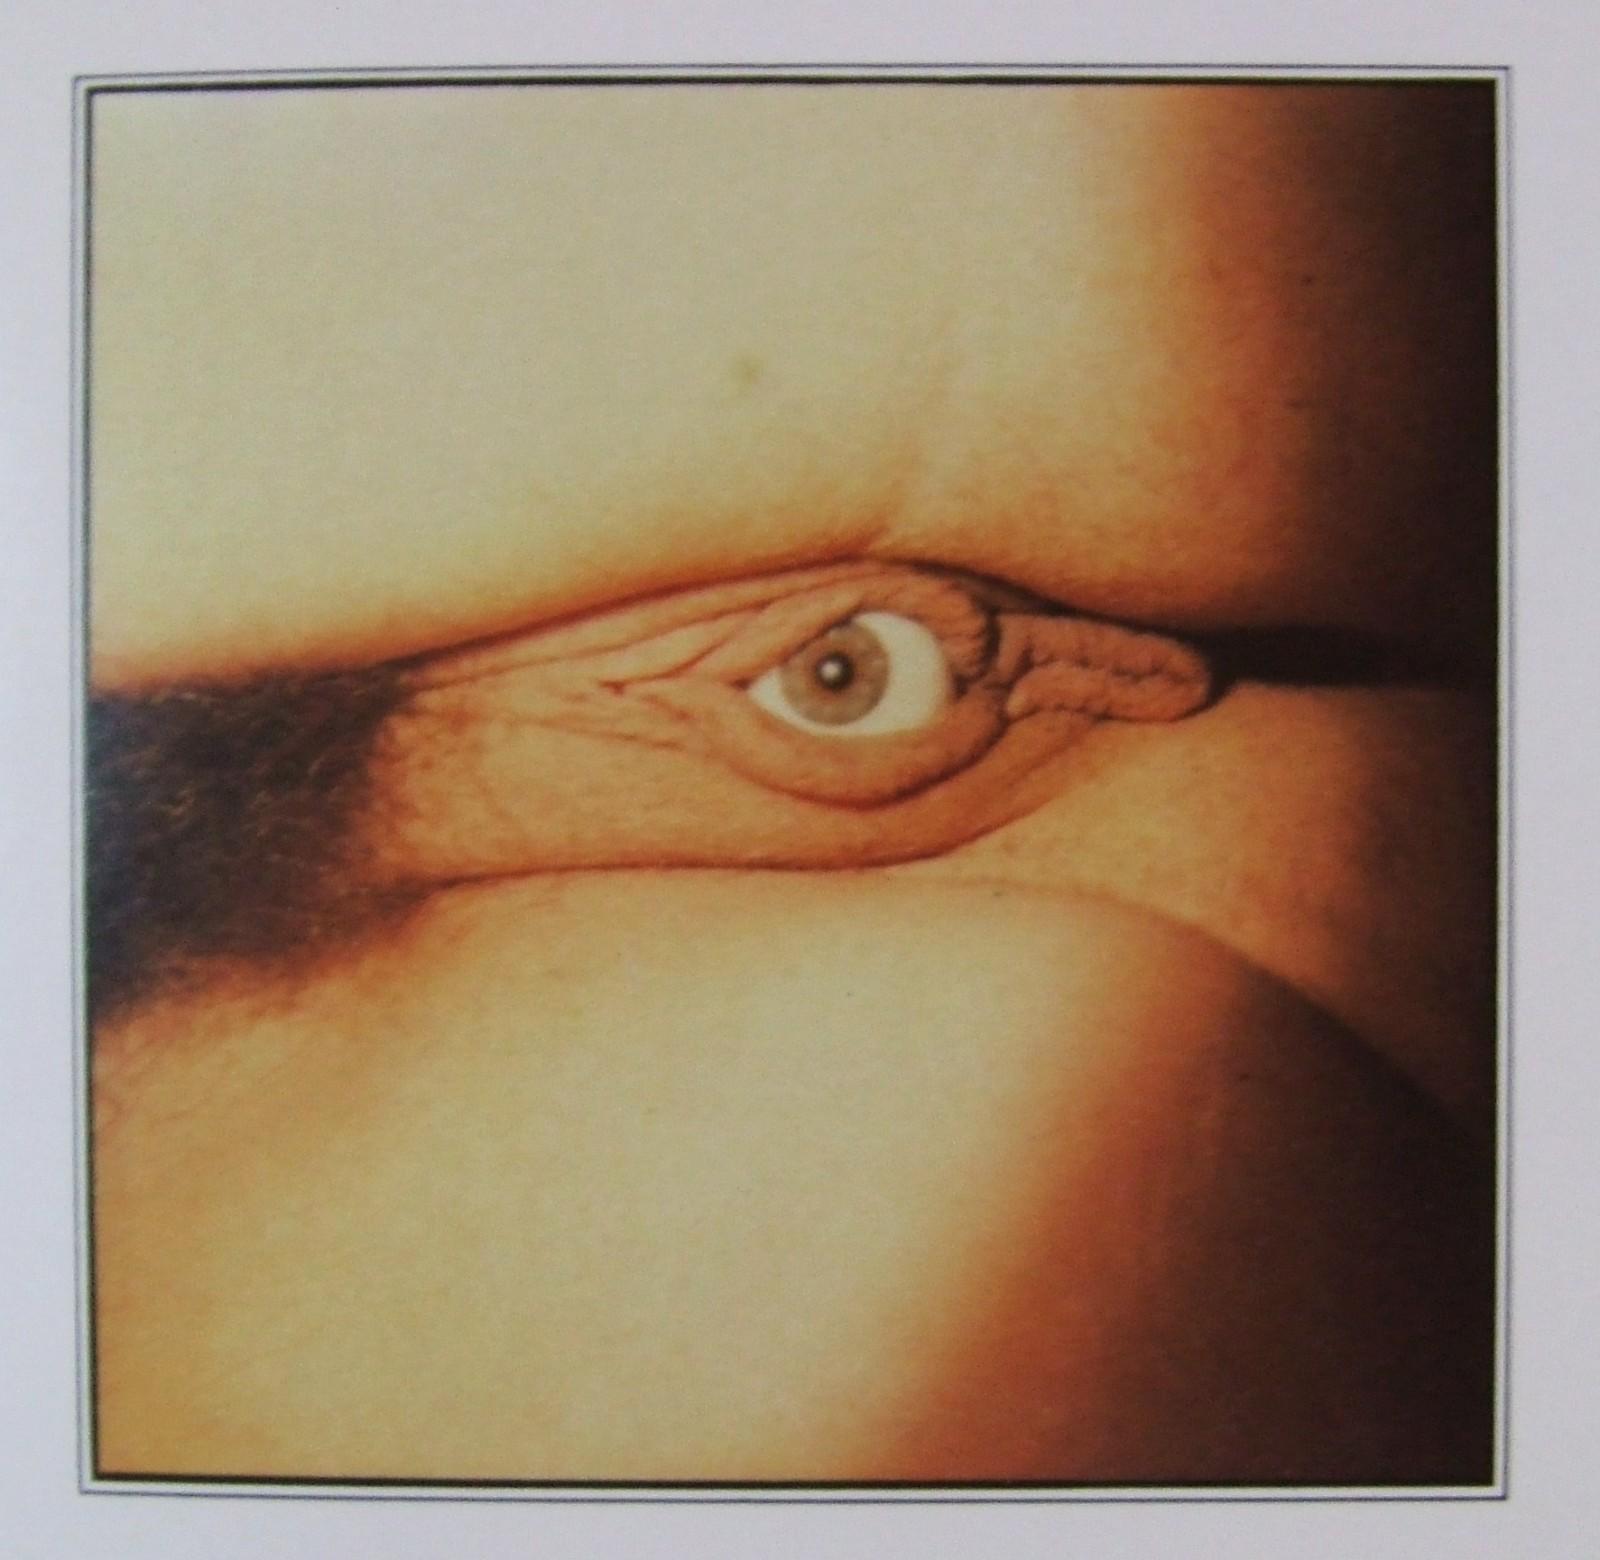 Картинка пизда с глазками